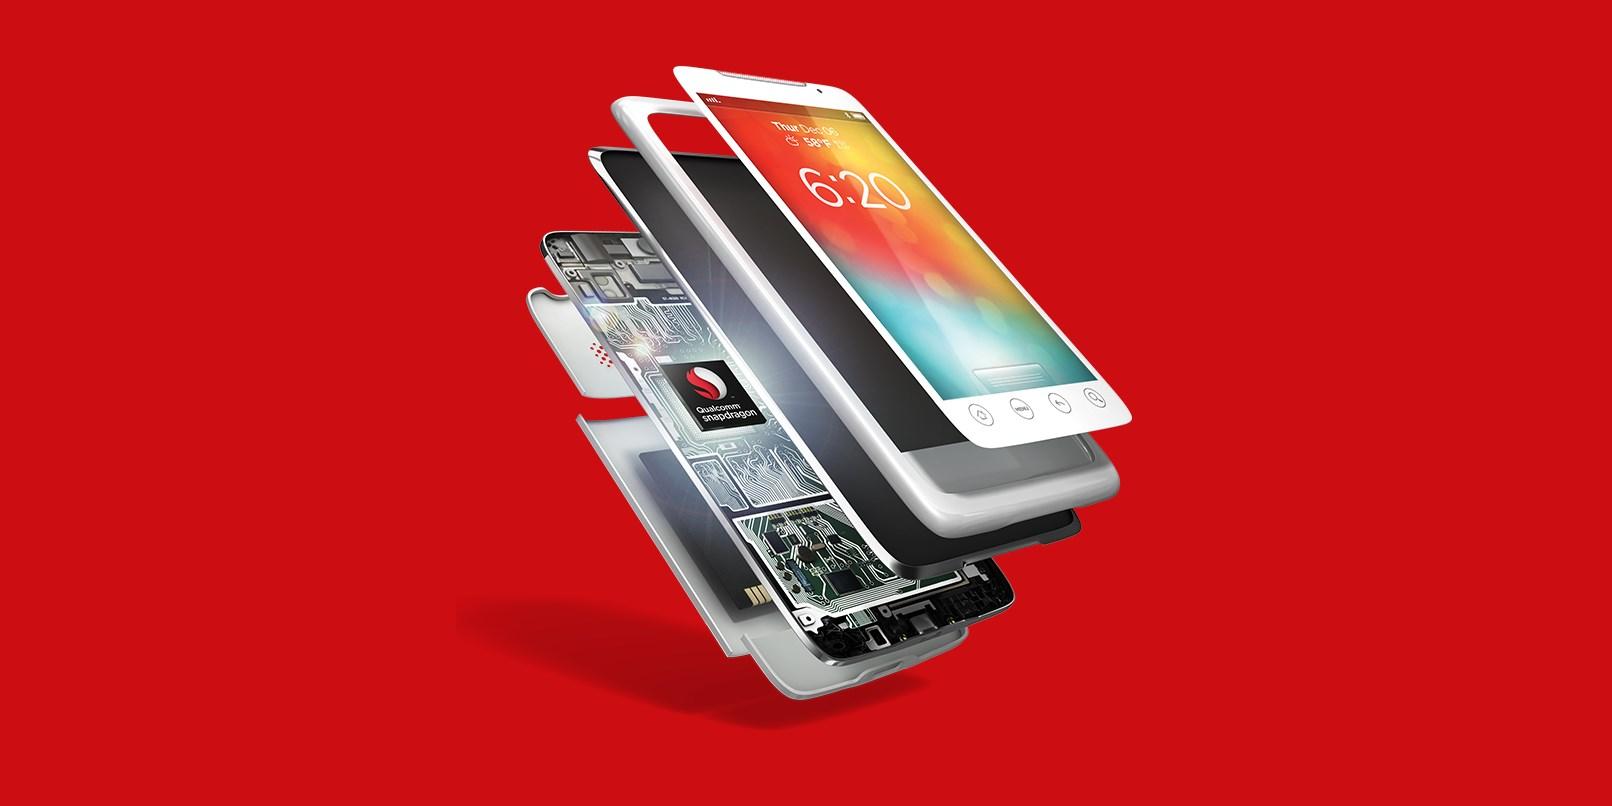 Snapdragon 820 mobile processor promises better performance